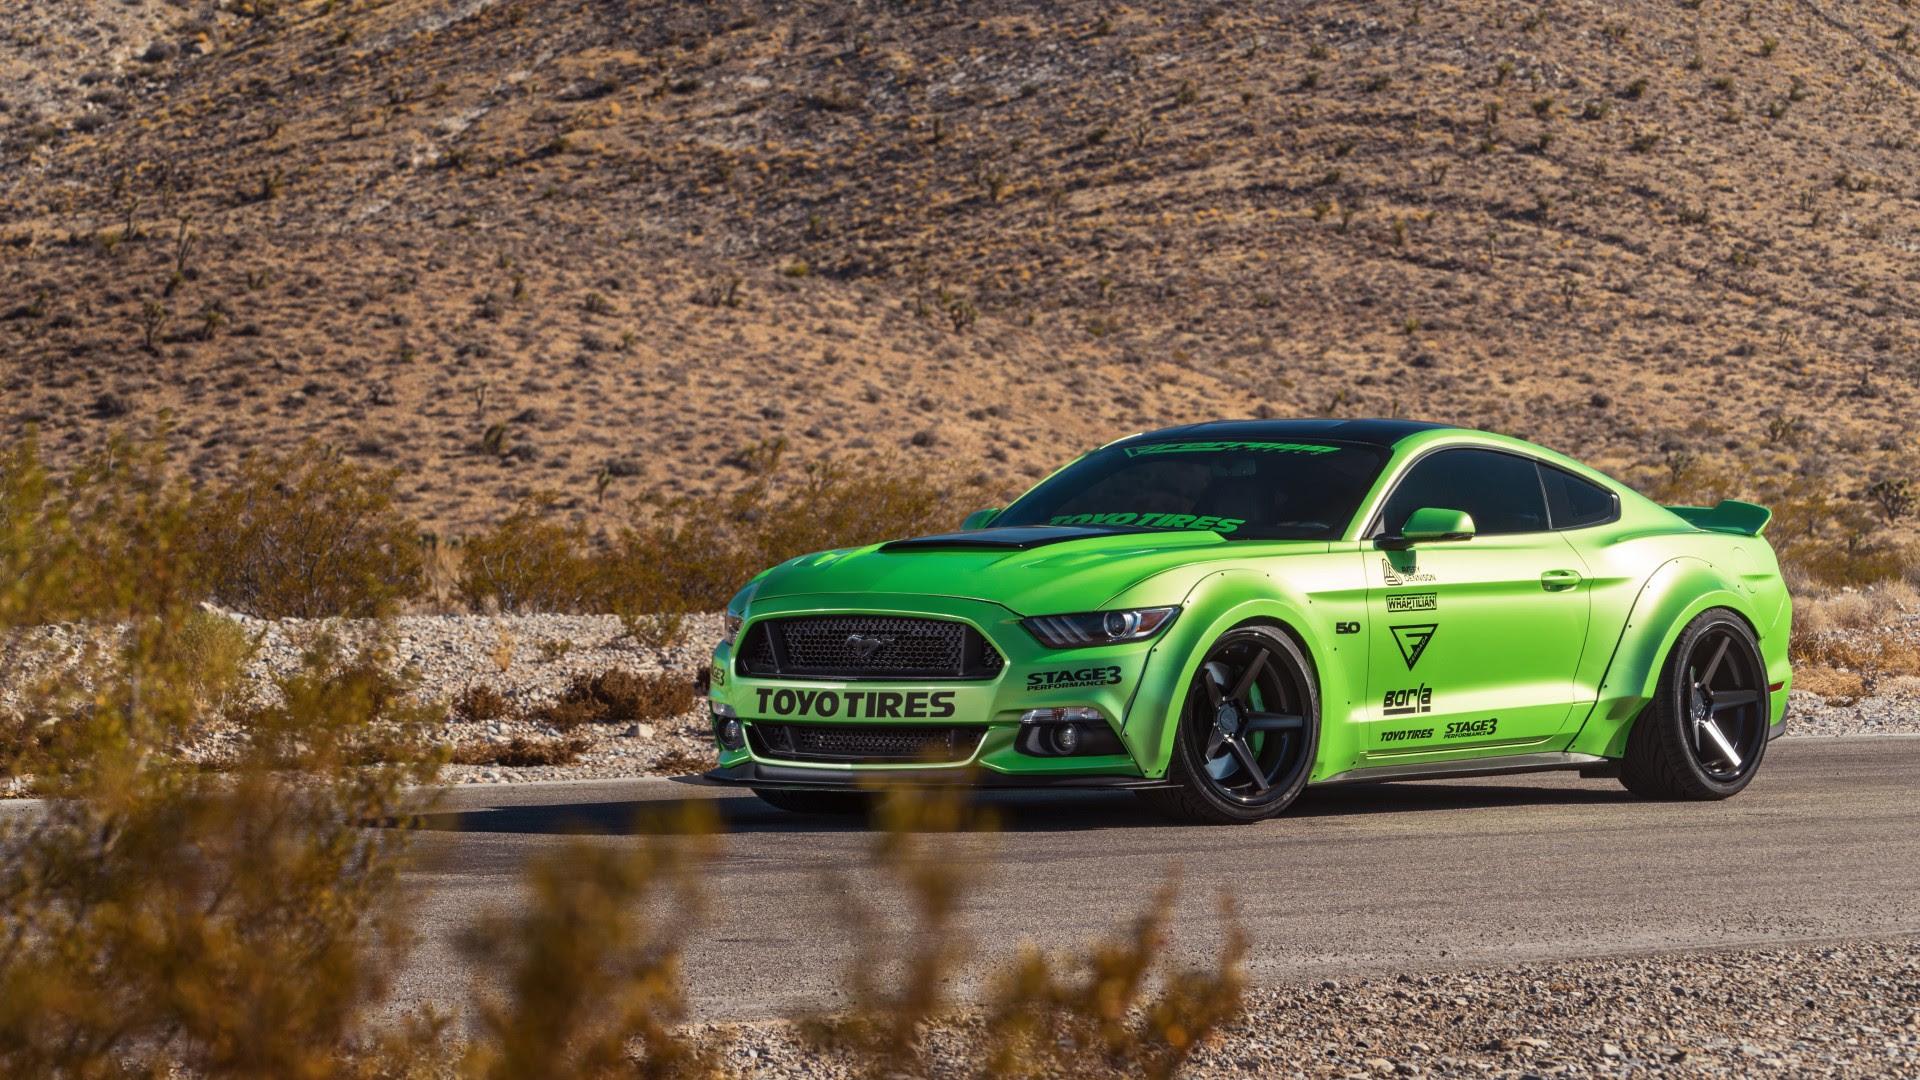 Green Ford Mustang GT Ferrada Wheels 5K Wallpaper  HD Car Wallpapers  ID 7245